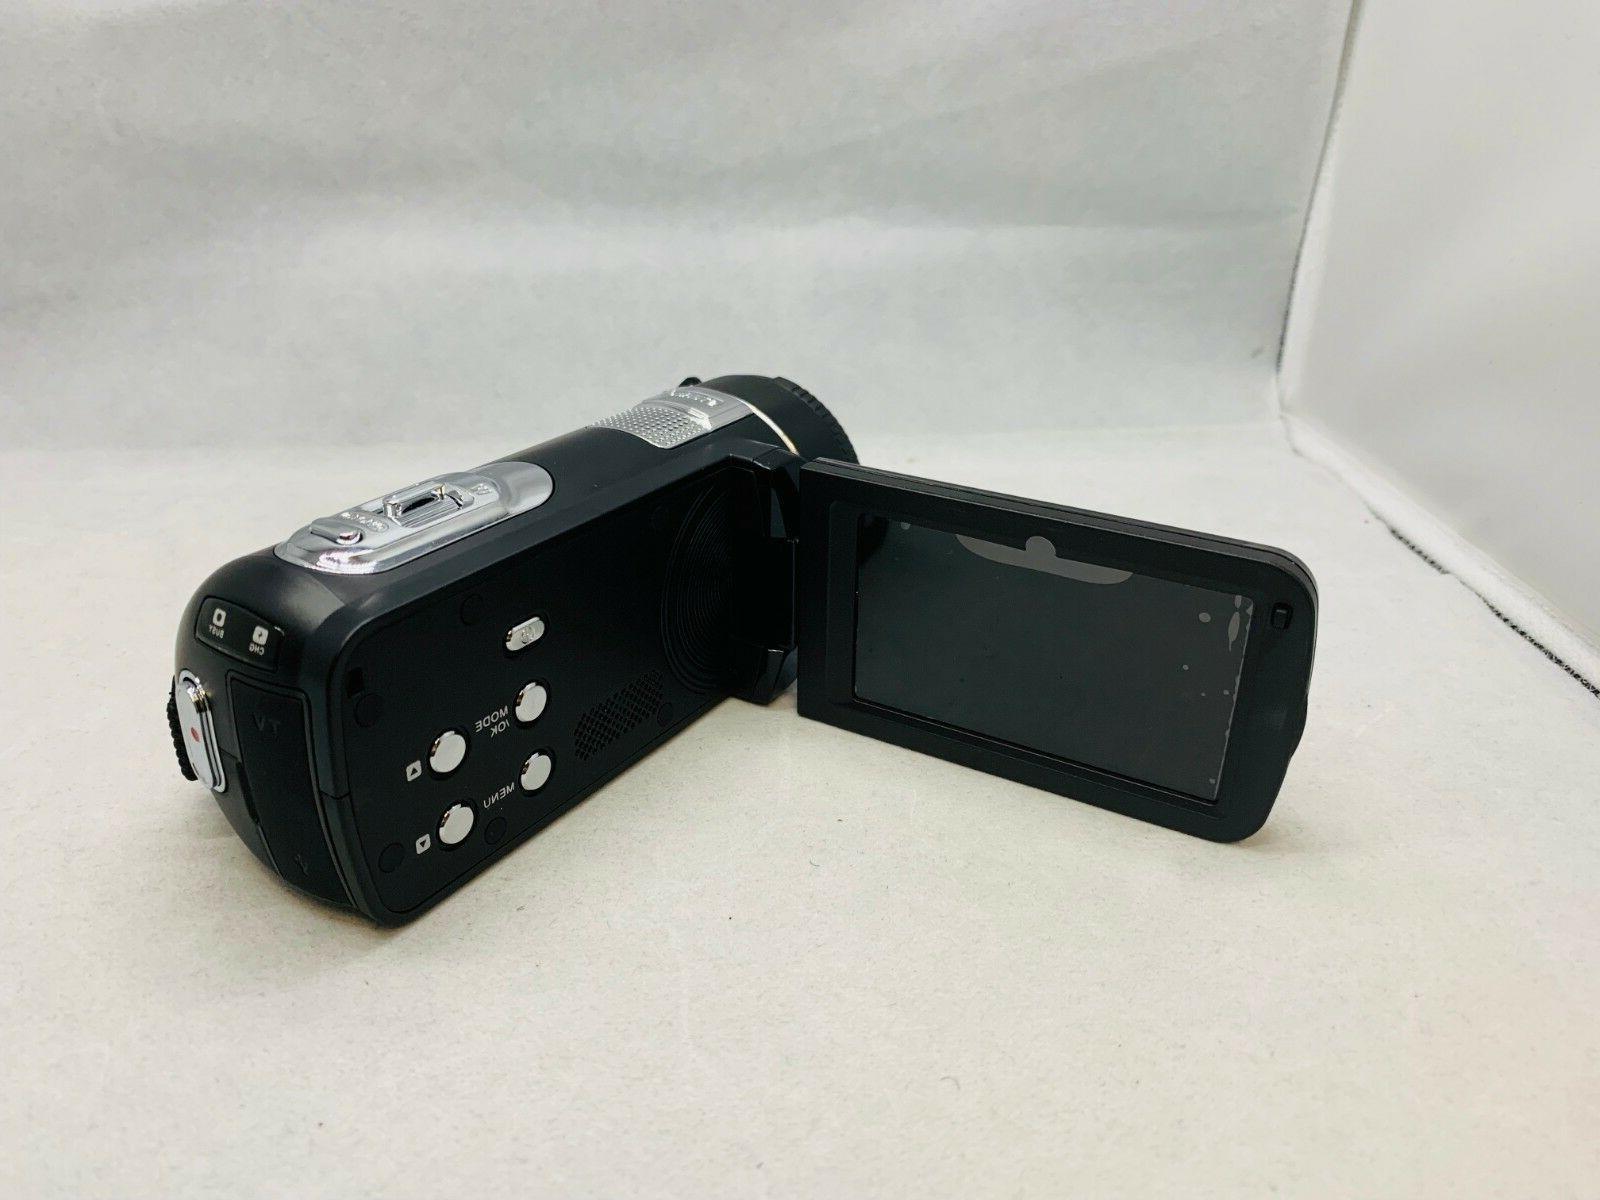 SEREE Camcorder FHD 24.0 HDMI 18× Zoom